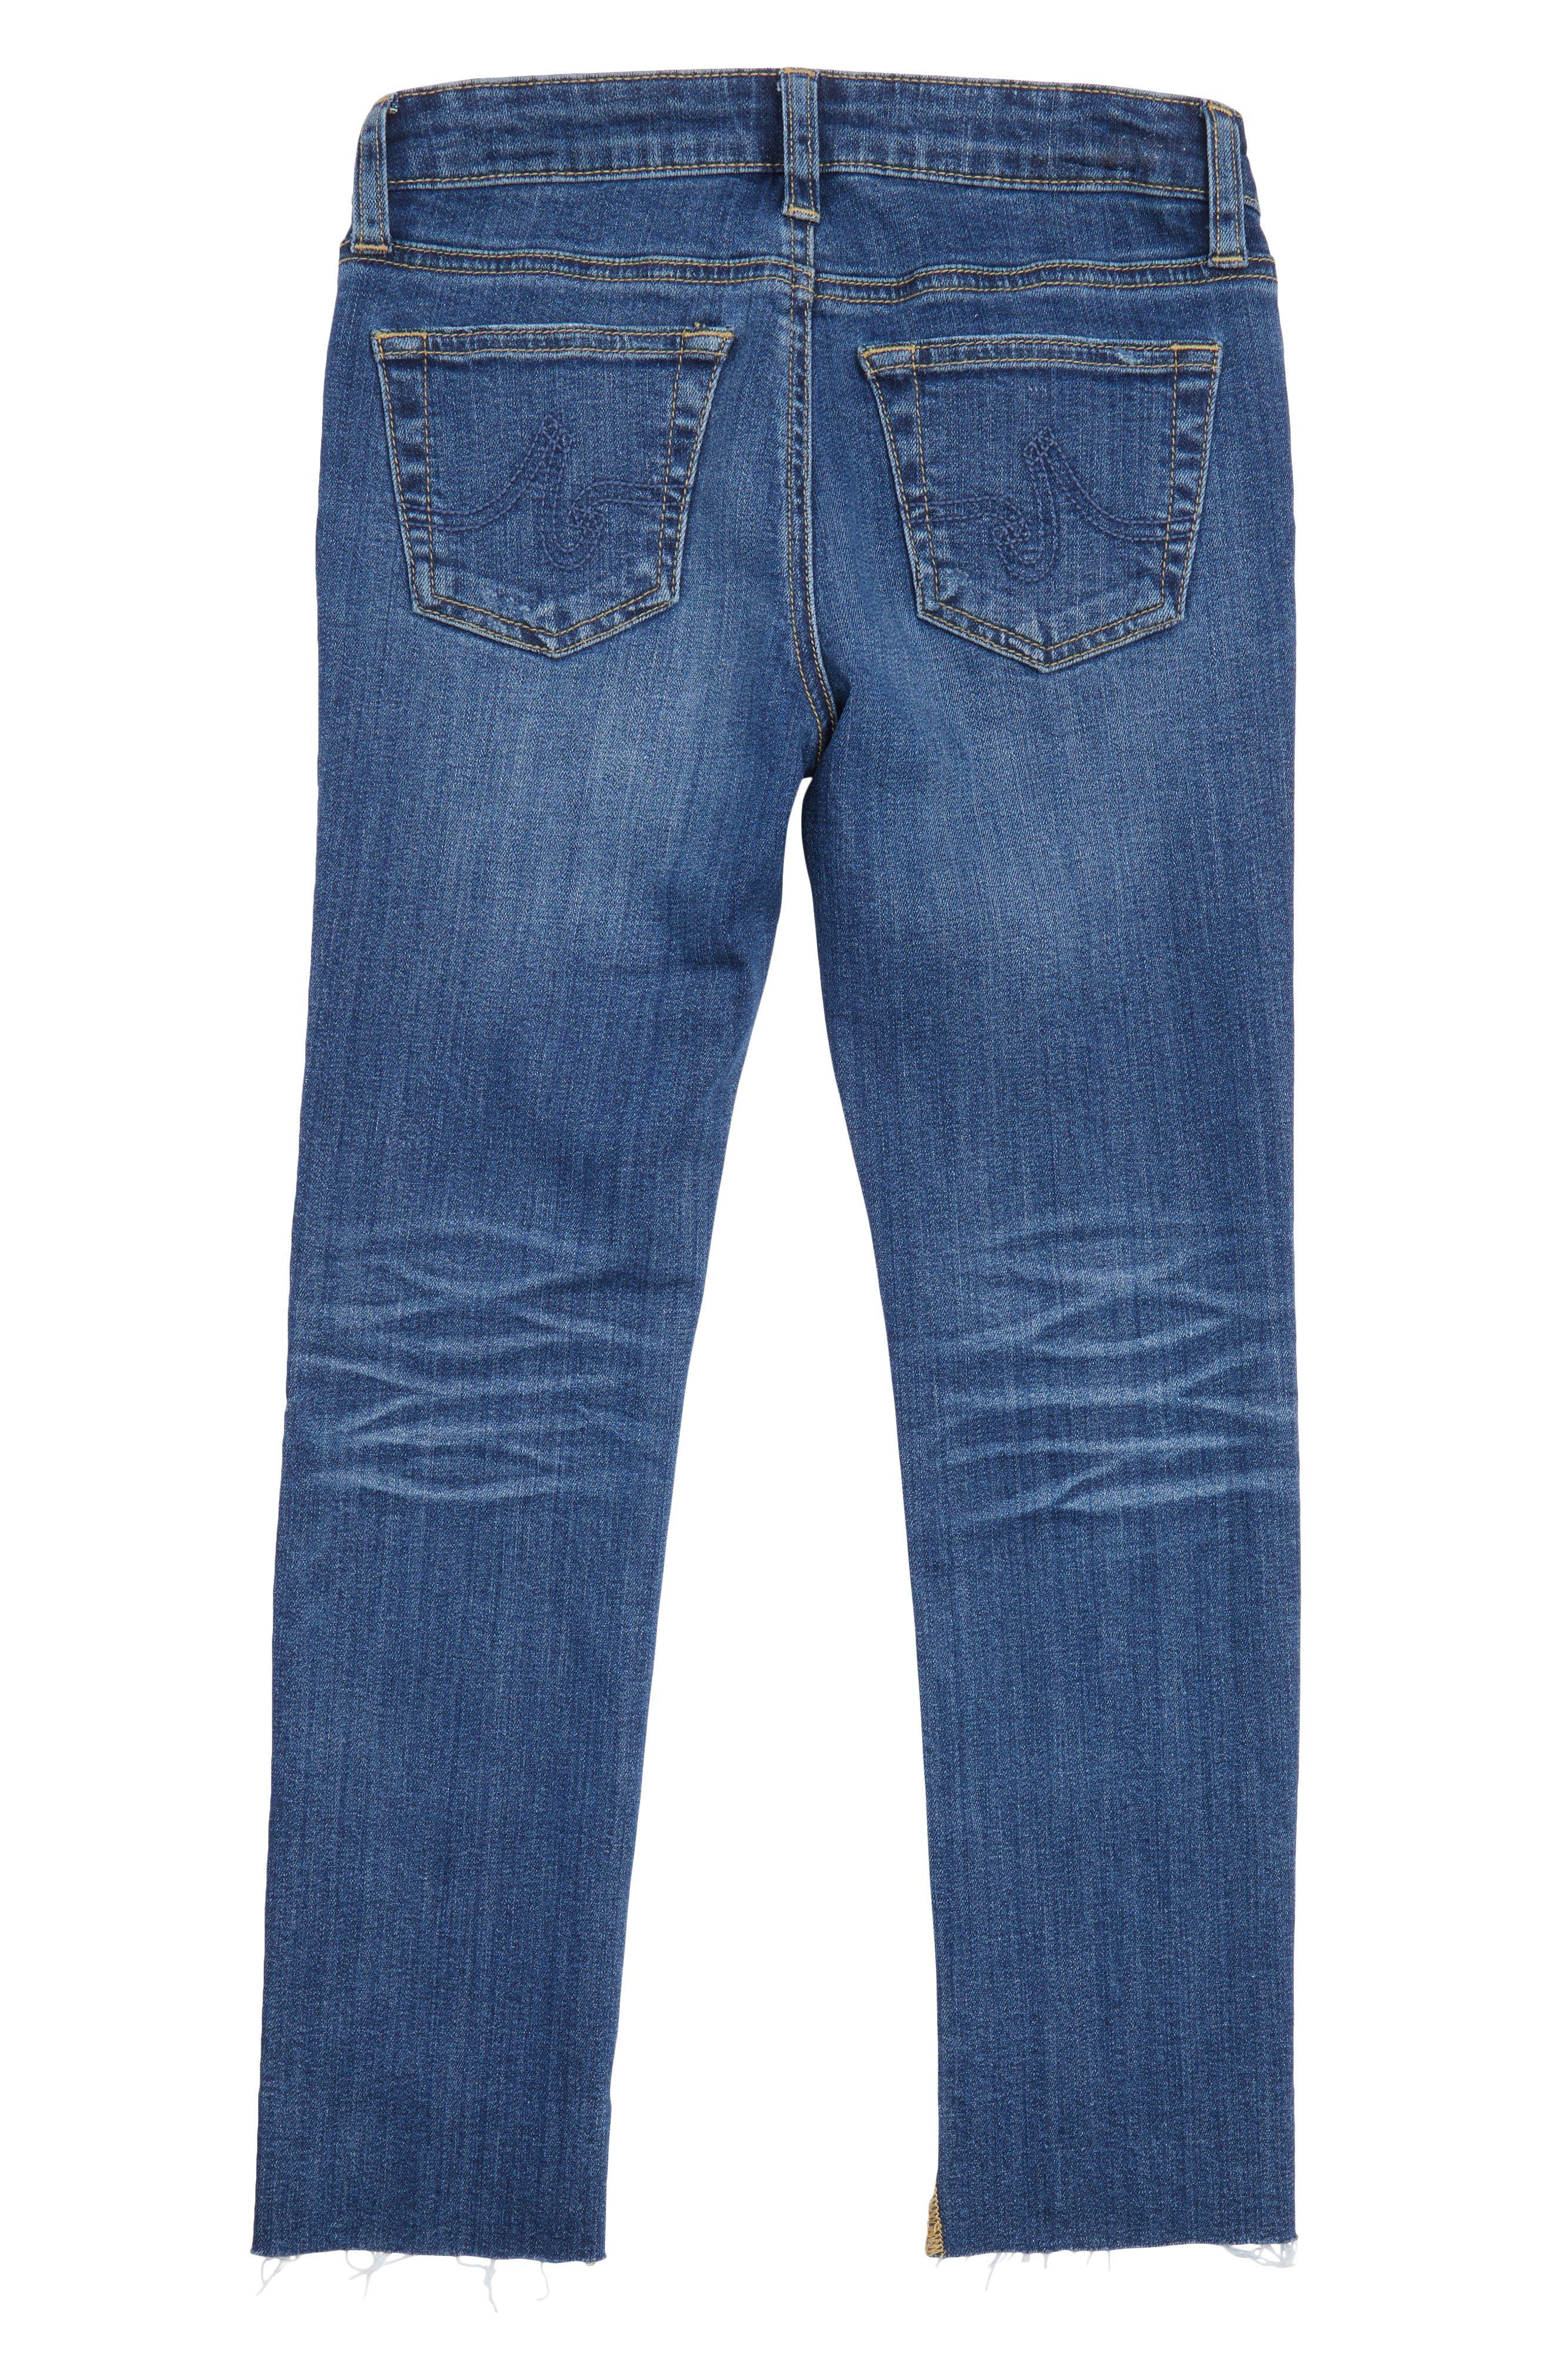 Alternate Image 2  - ag adriano goldschmied kids The Kate Slim Straight Leg Jeans (Big Girls)